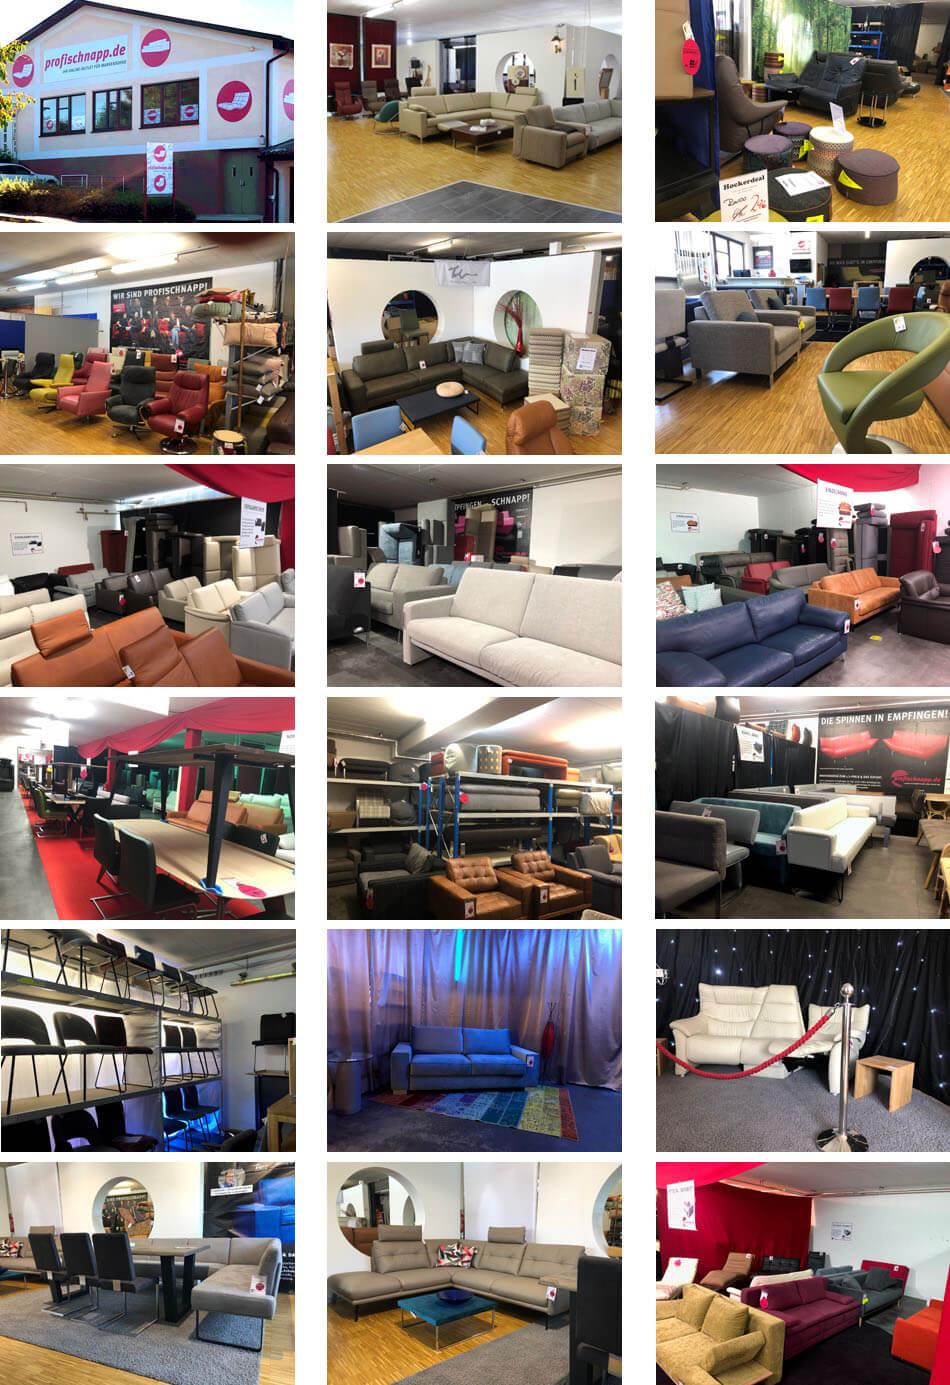 showroom_empfingen_2019-08DdGsTLjMhoDQl